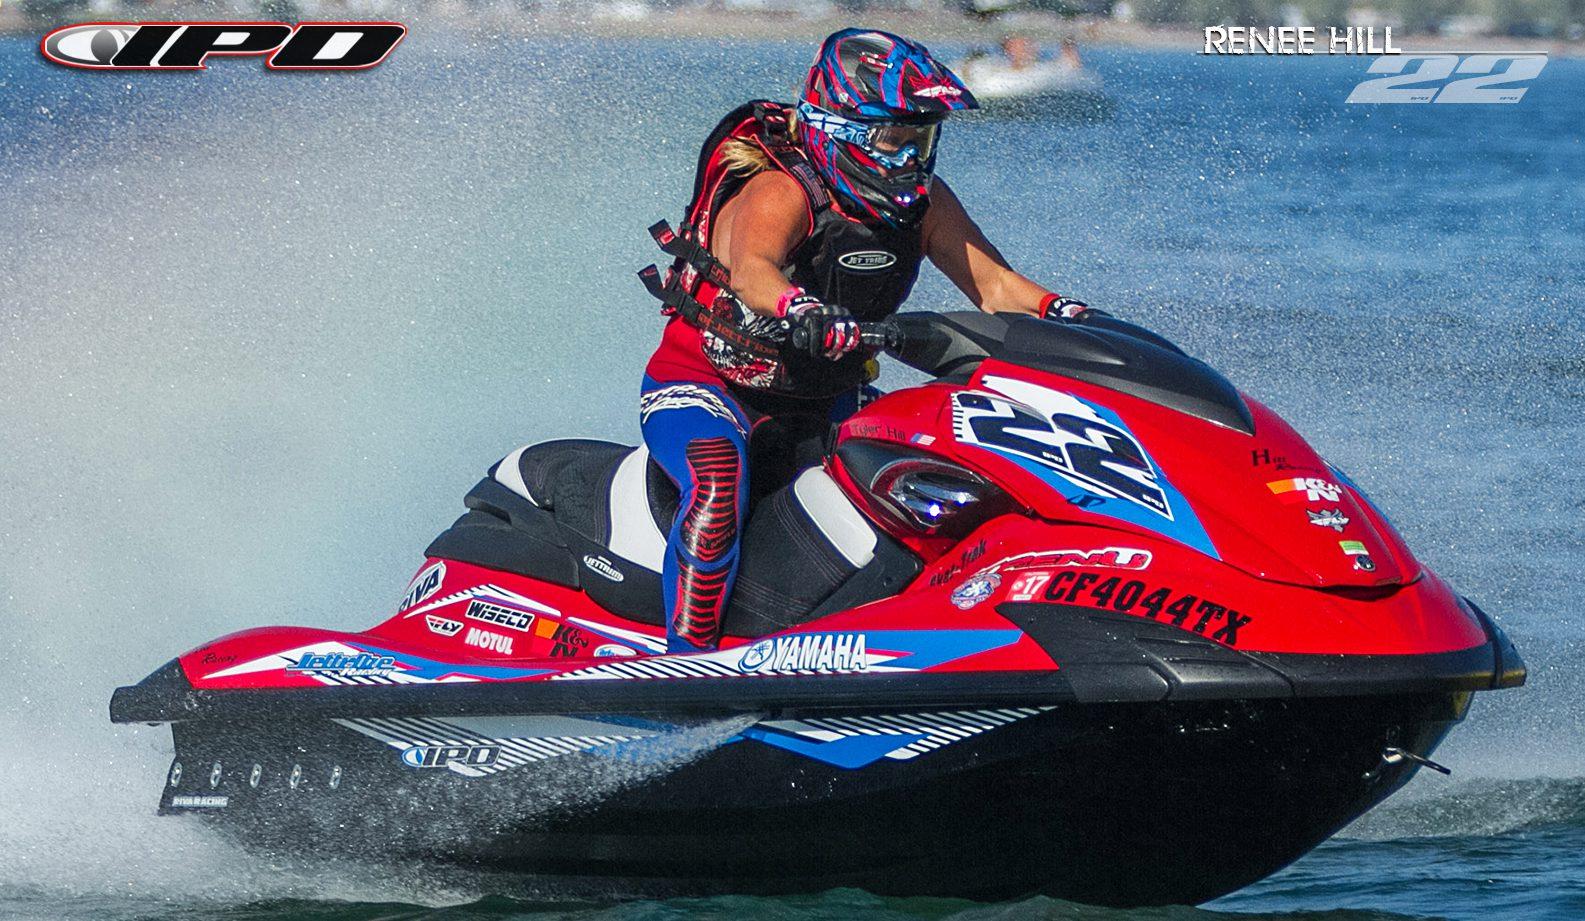 Ipd jet ski graphics race inspired jet ski graphics for Jet ski prices yamaha